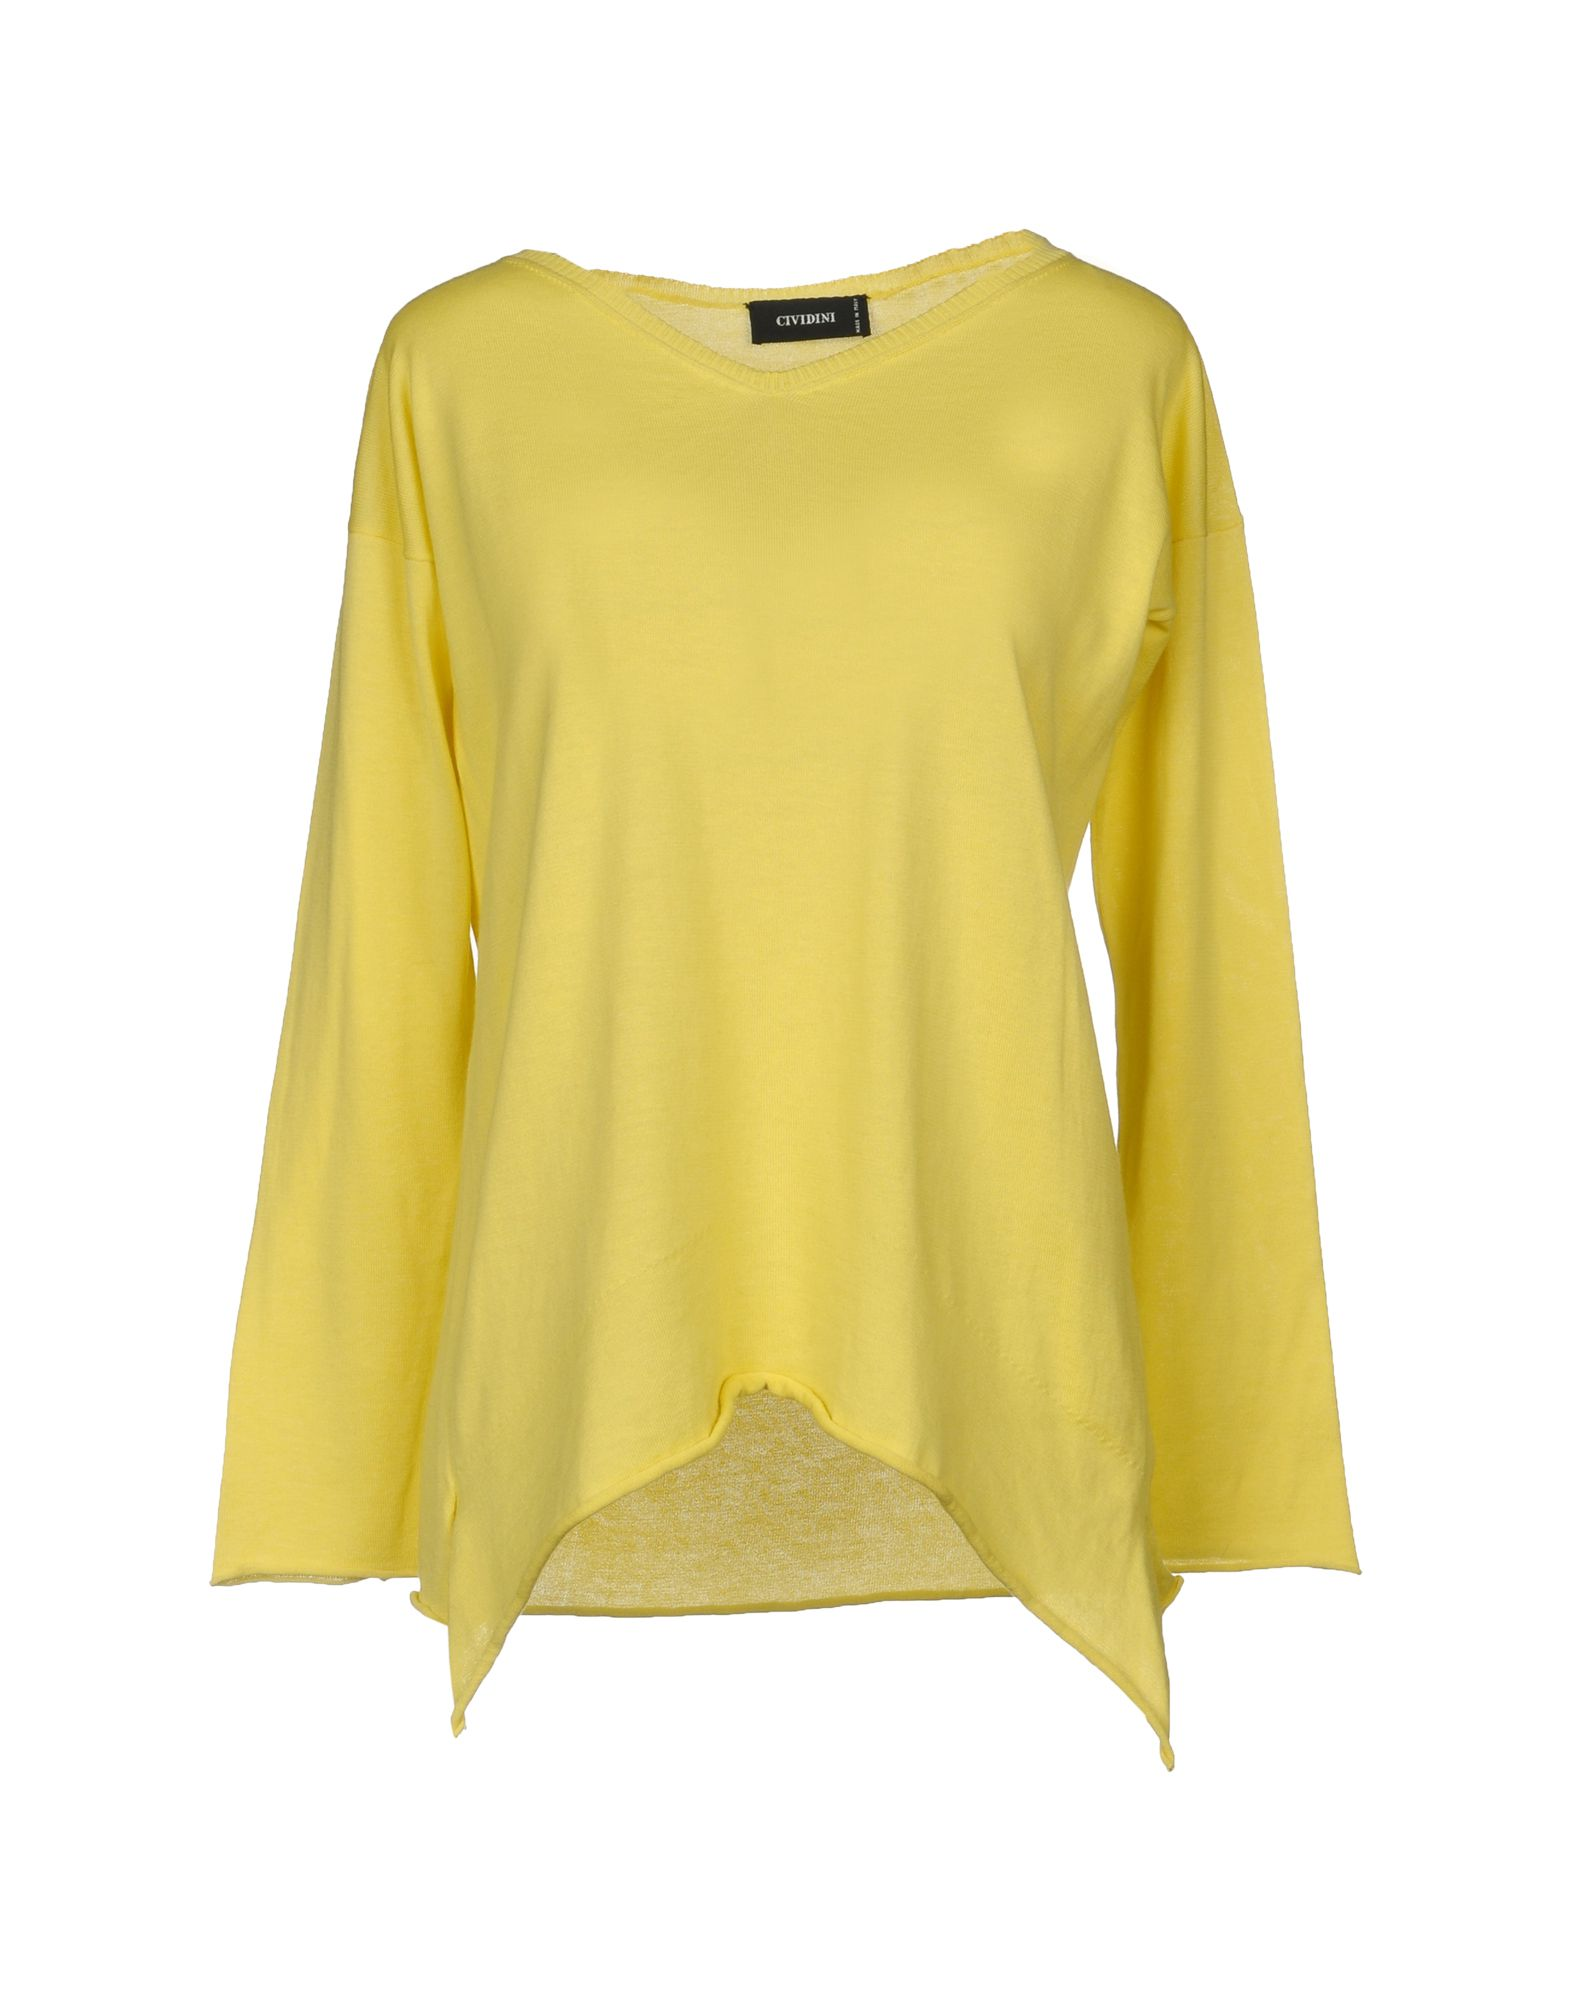 CIVIDINI Sweater in Light Yellow